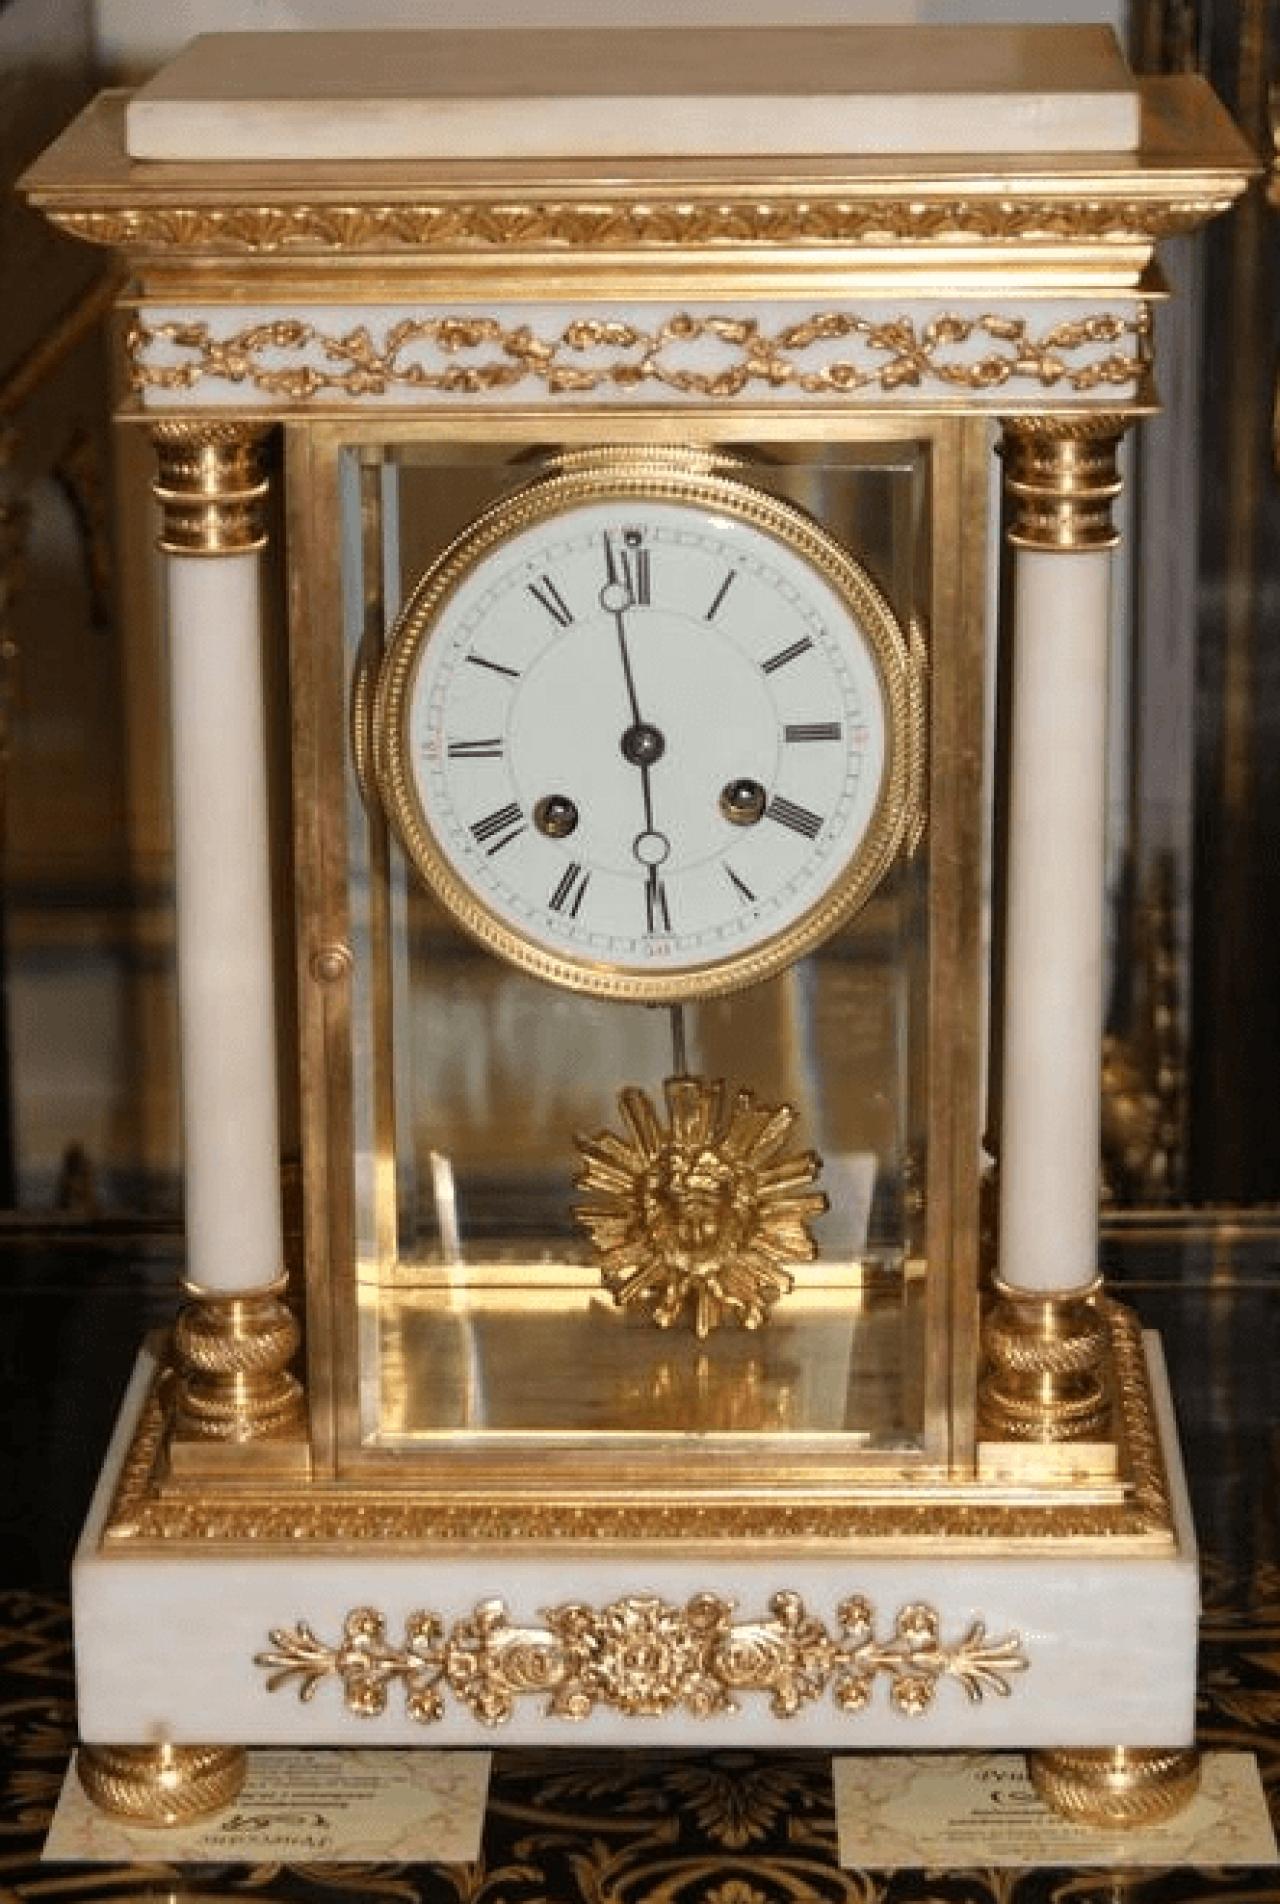 Horloge De Bureau Originale l'horloge de bureau de style empire, la france du xixe siècle